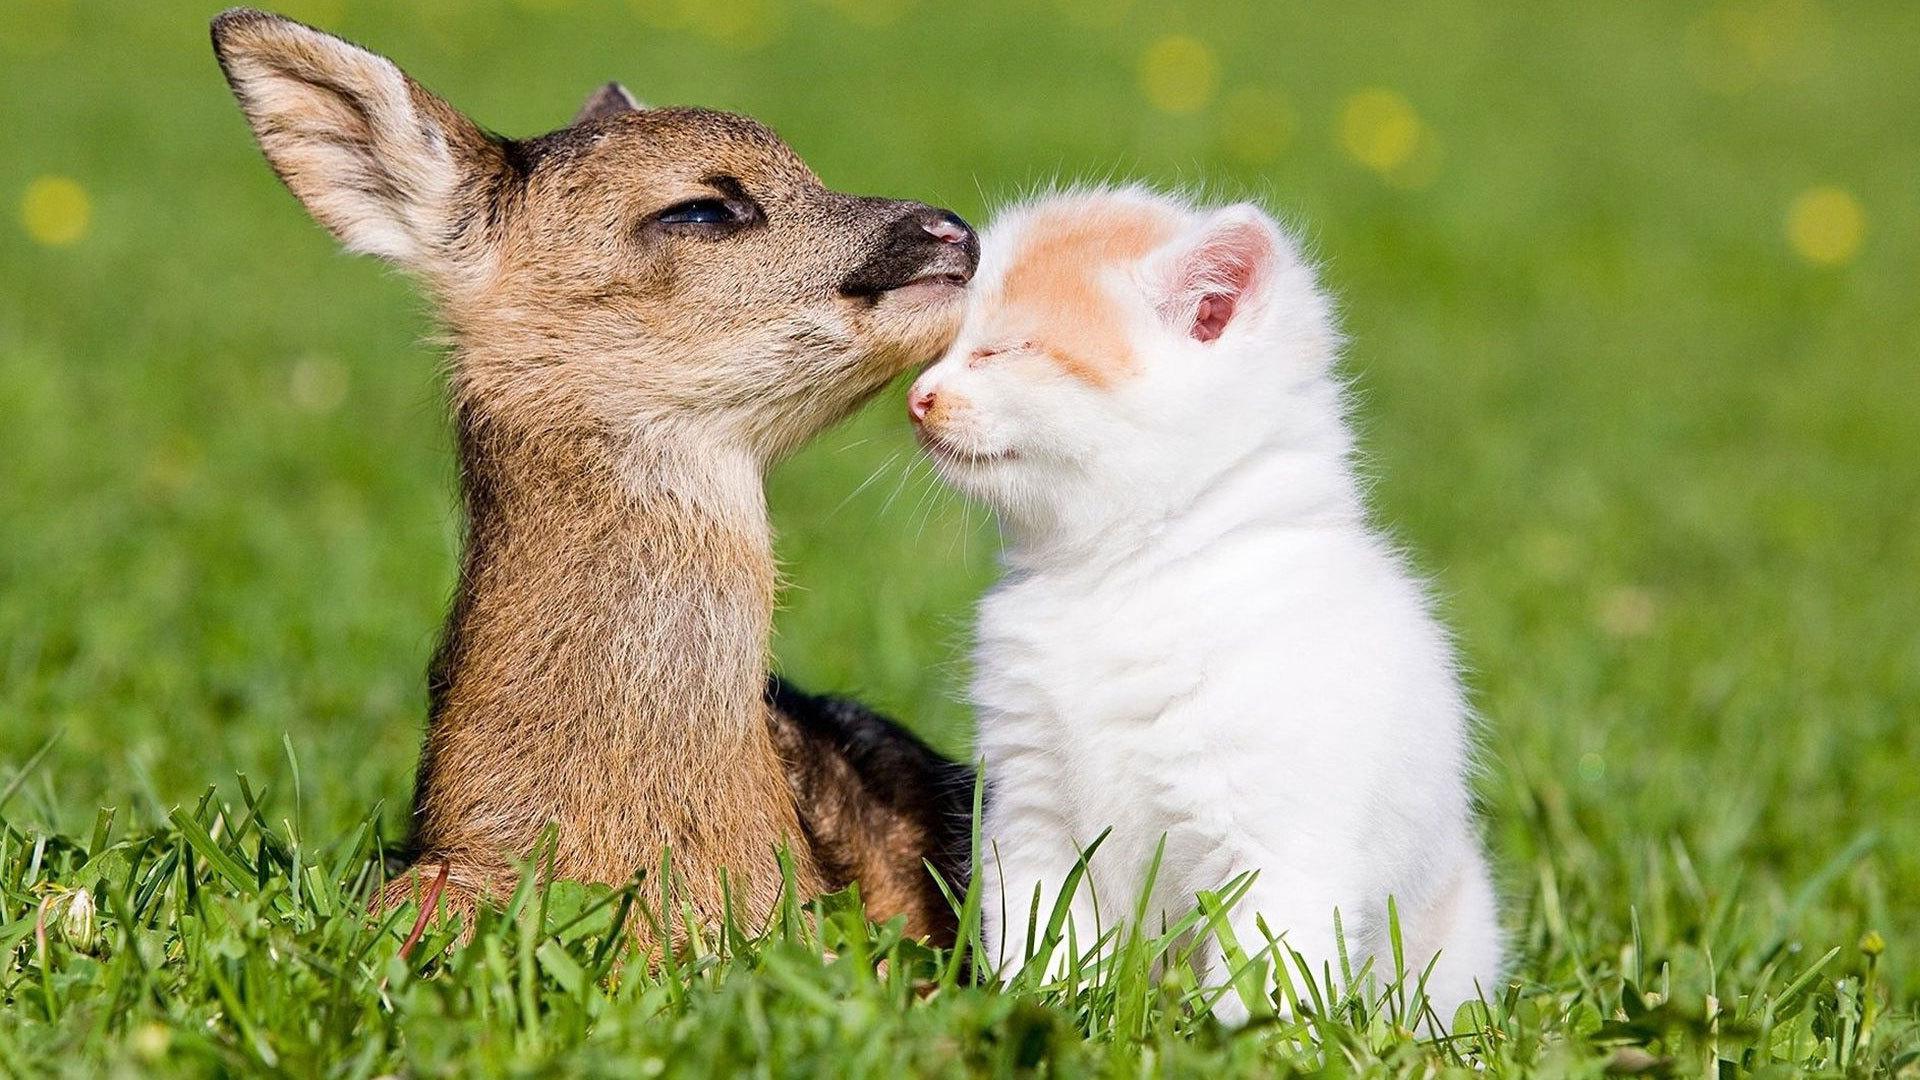 Cute Fawns (Baby Deer)